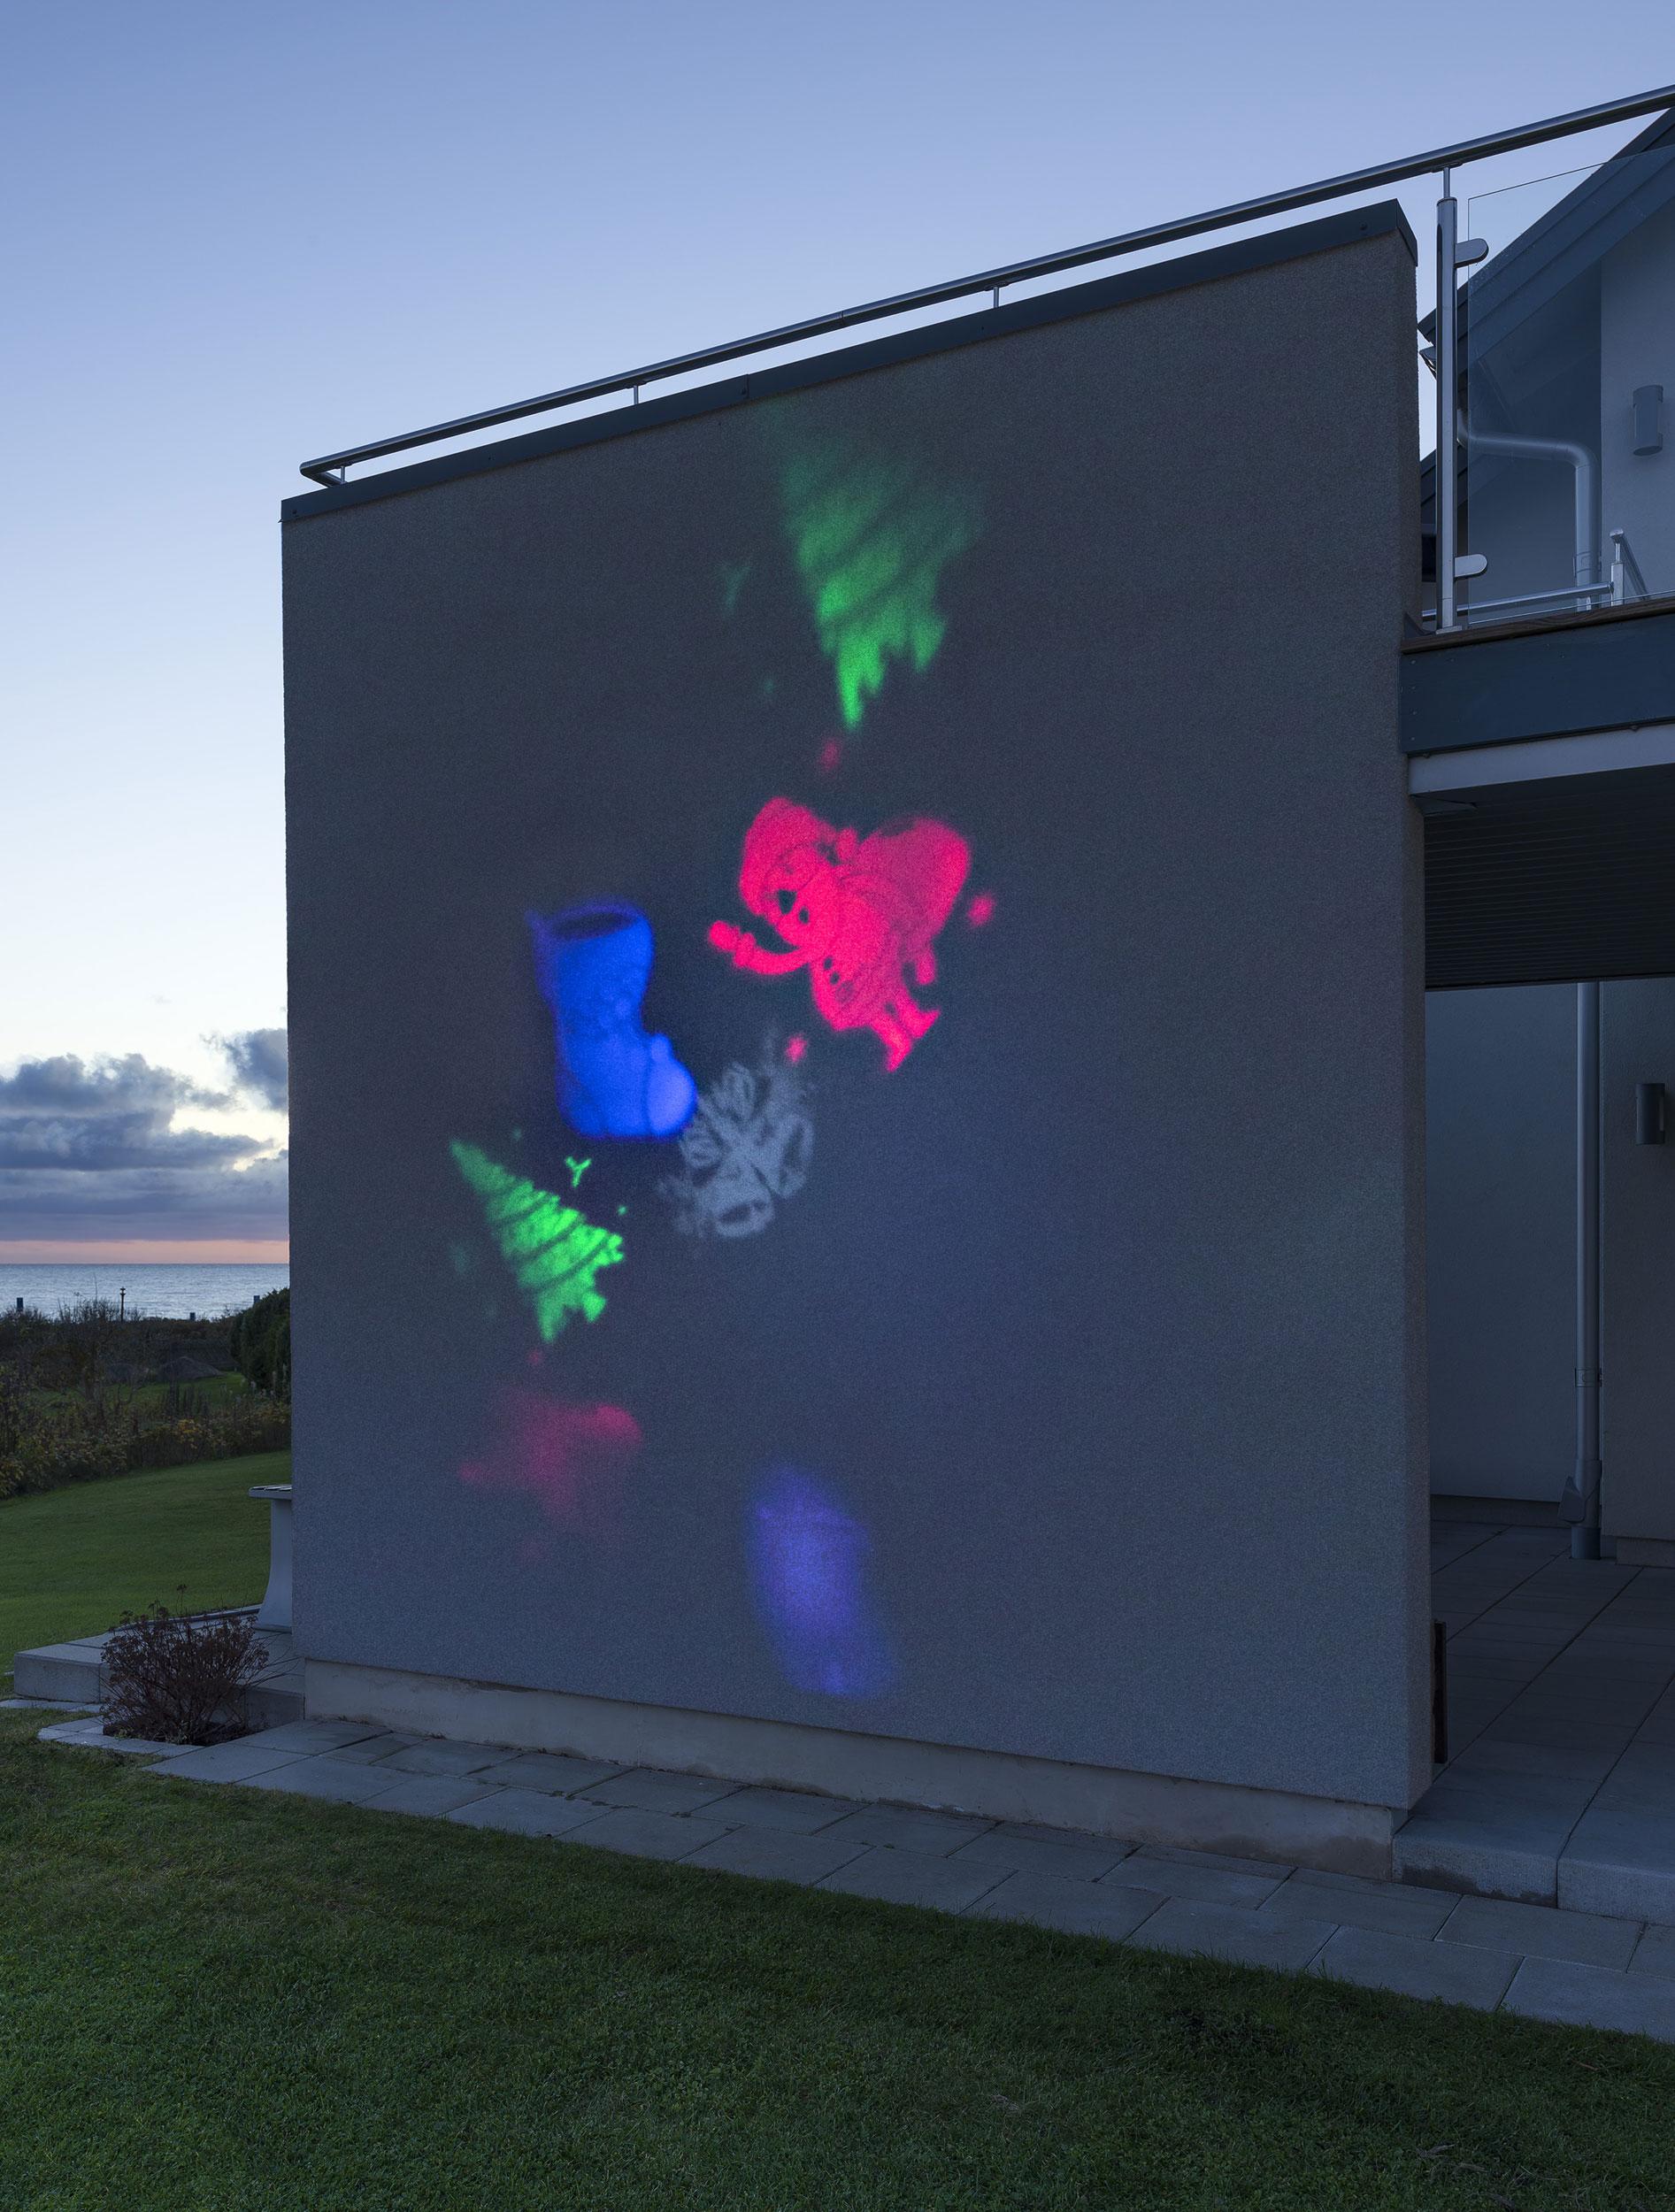 Weihnachtsbeleuchtung Aussen Ersatzbirnen.Weihnachtsbeleuchtung Konstsmide Led Lichtprojektor Weihnachtsfiguren